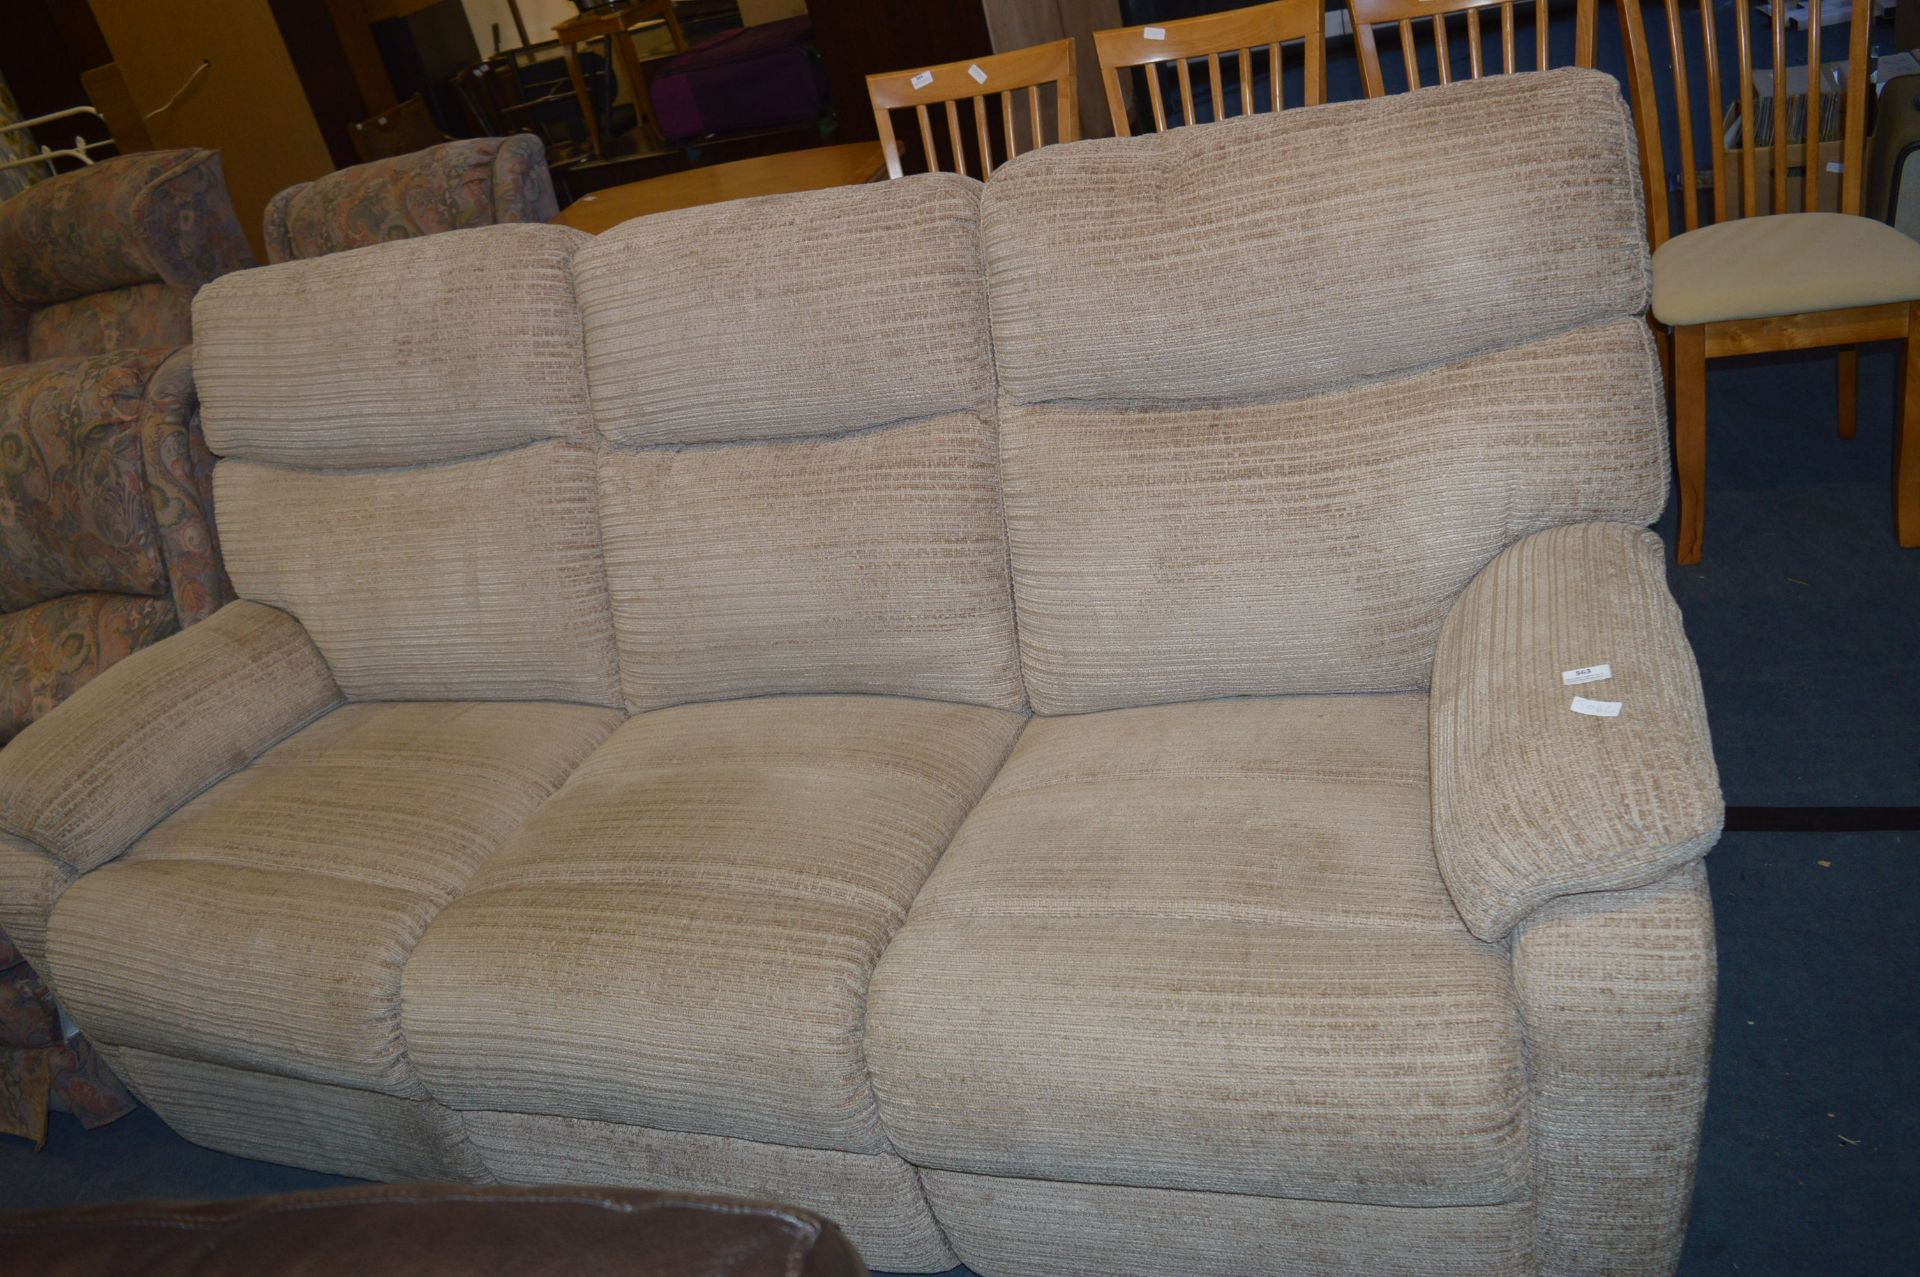 Lot 563 - Three Seat Upholstered Sofa